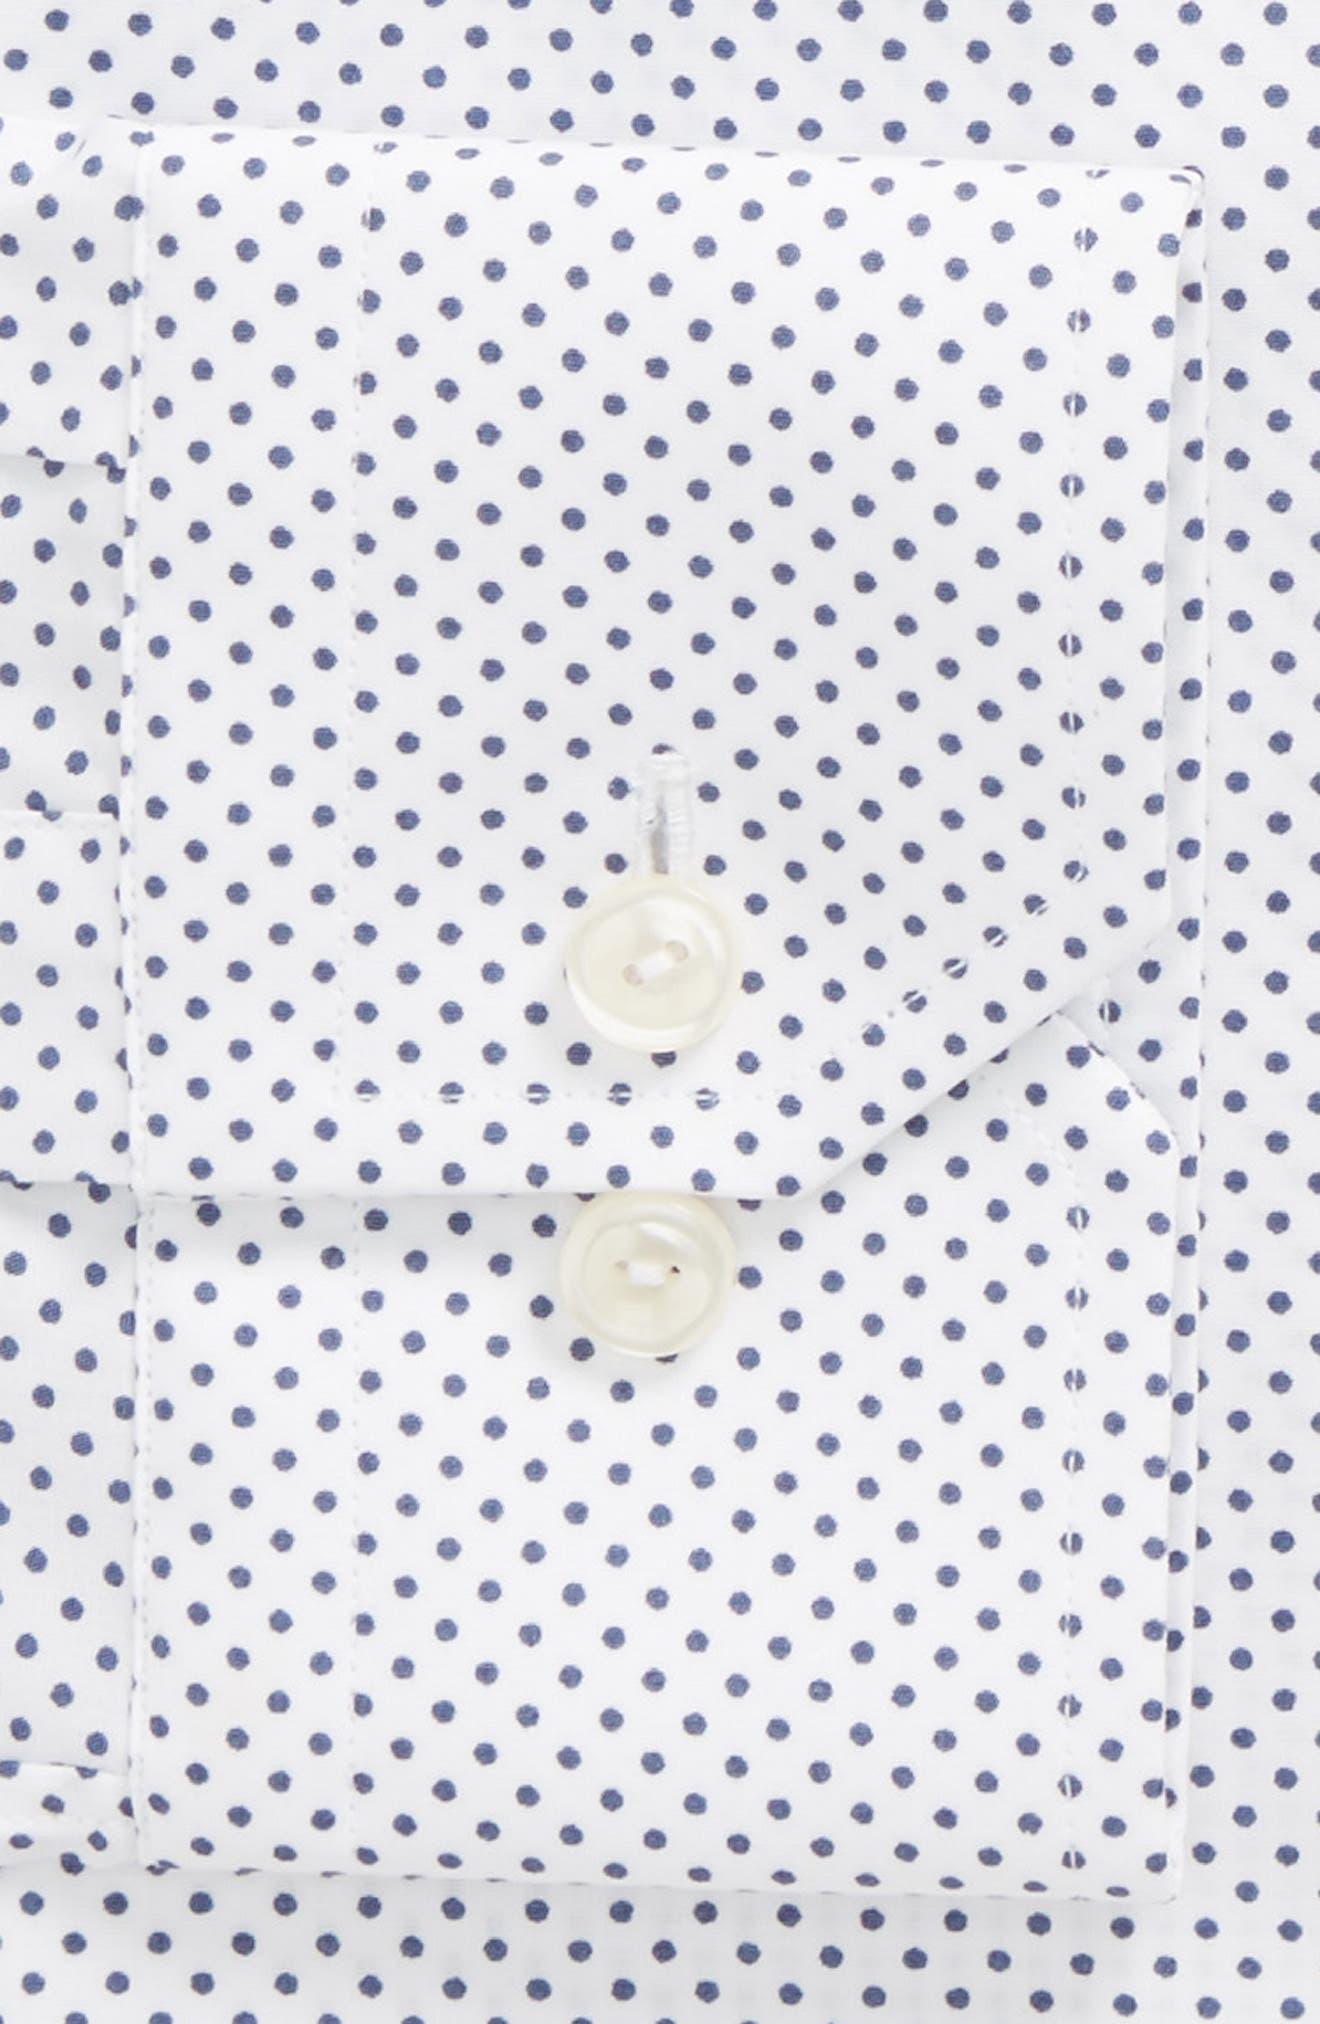 Slim Fit Dot Dress Shirt,                             Alternate thumbnail 6, color,                             100